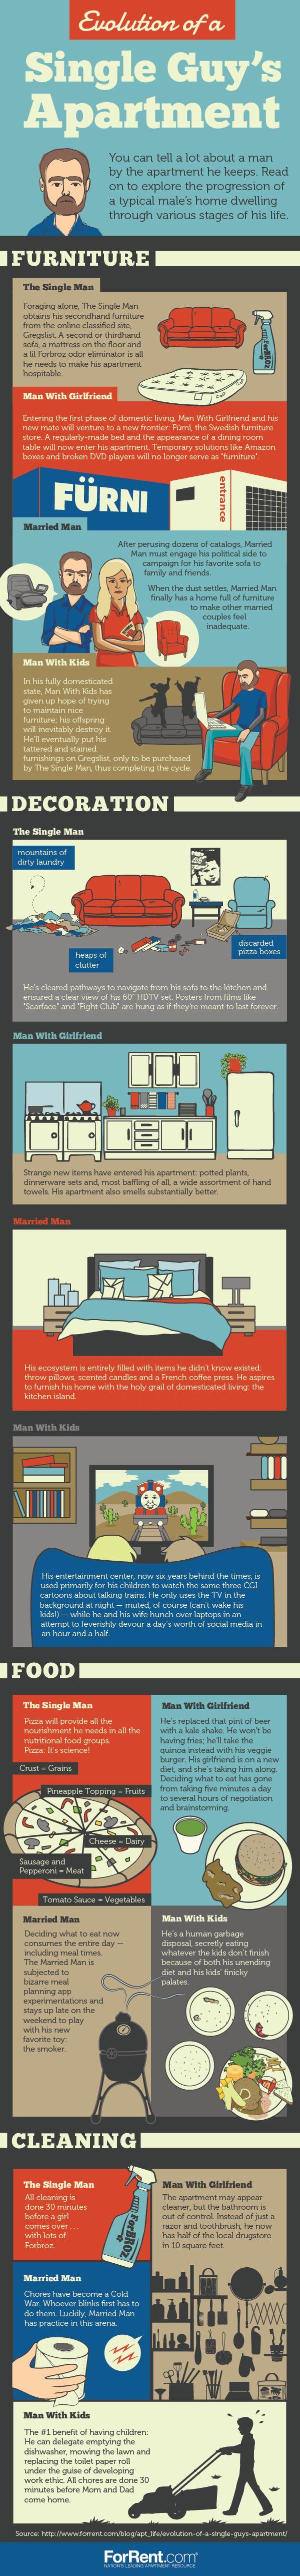 Evolution of a Single Guys Apartment